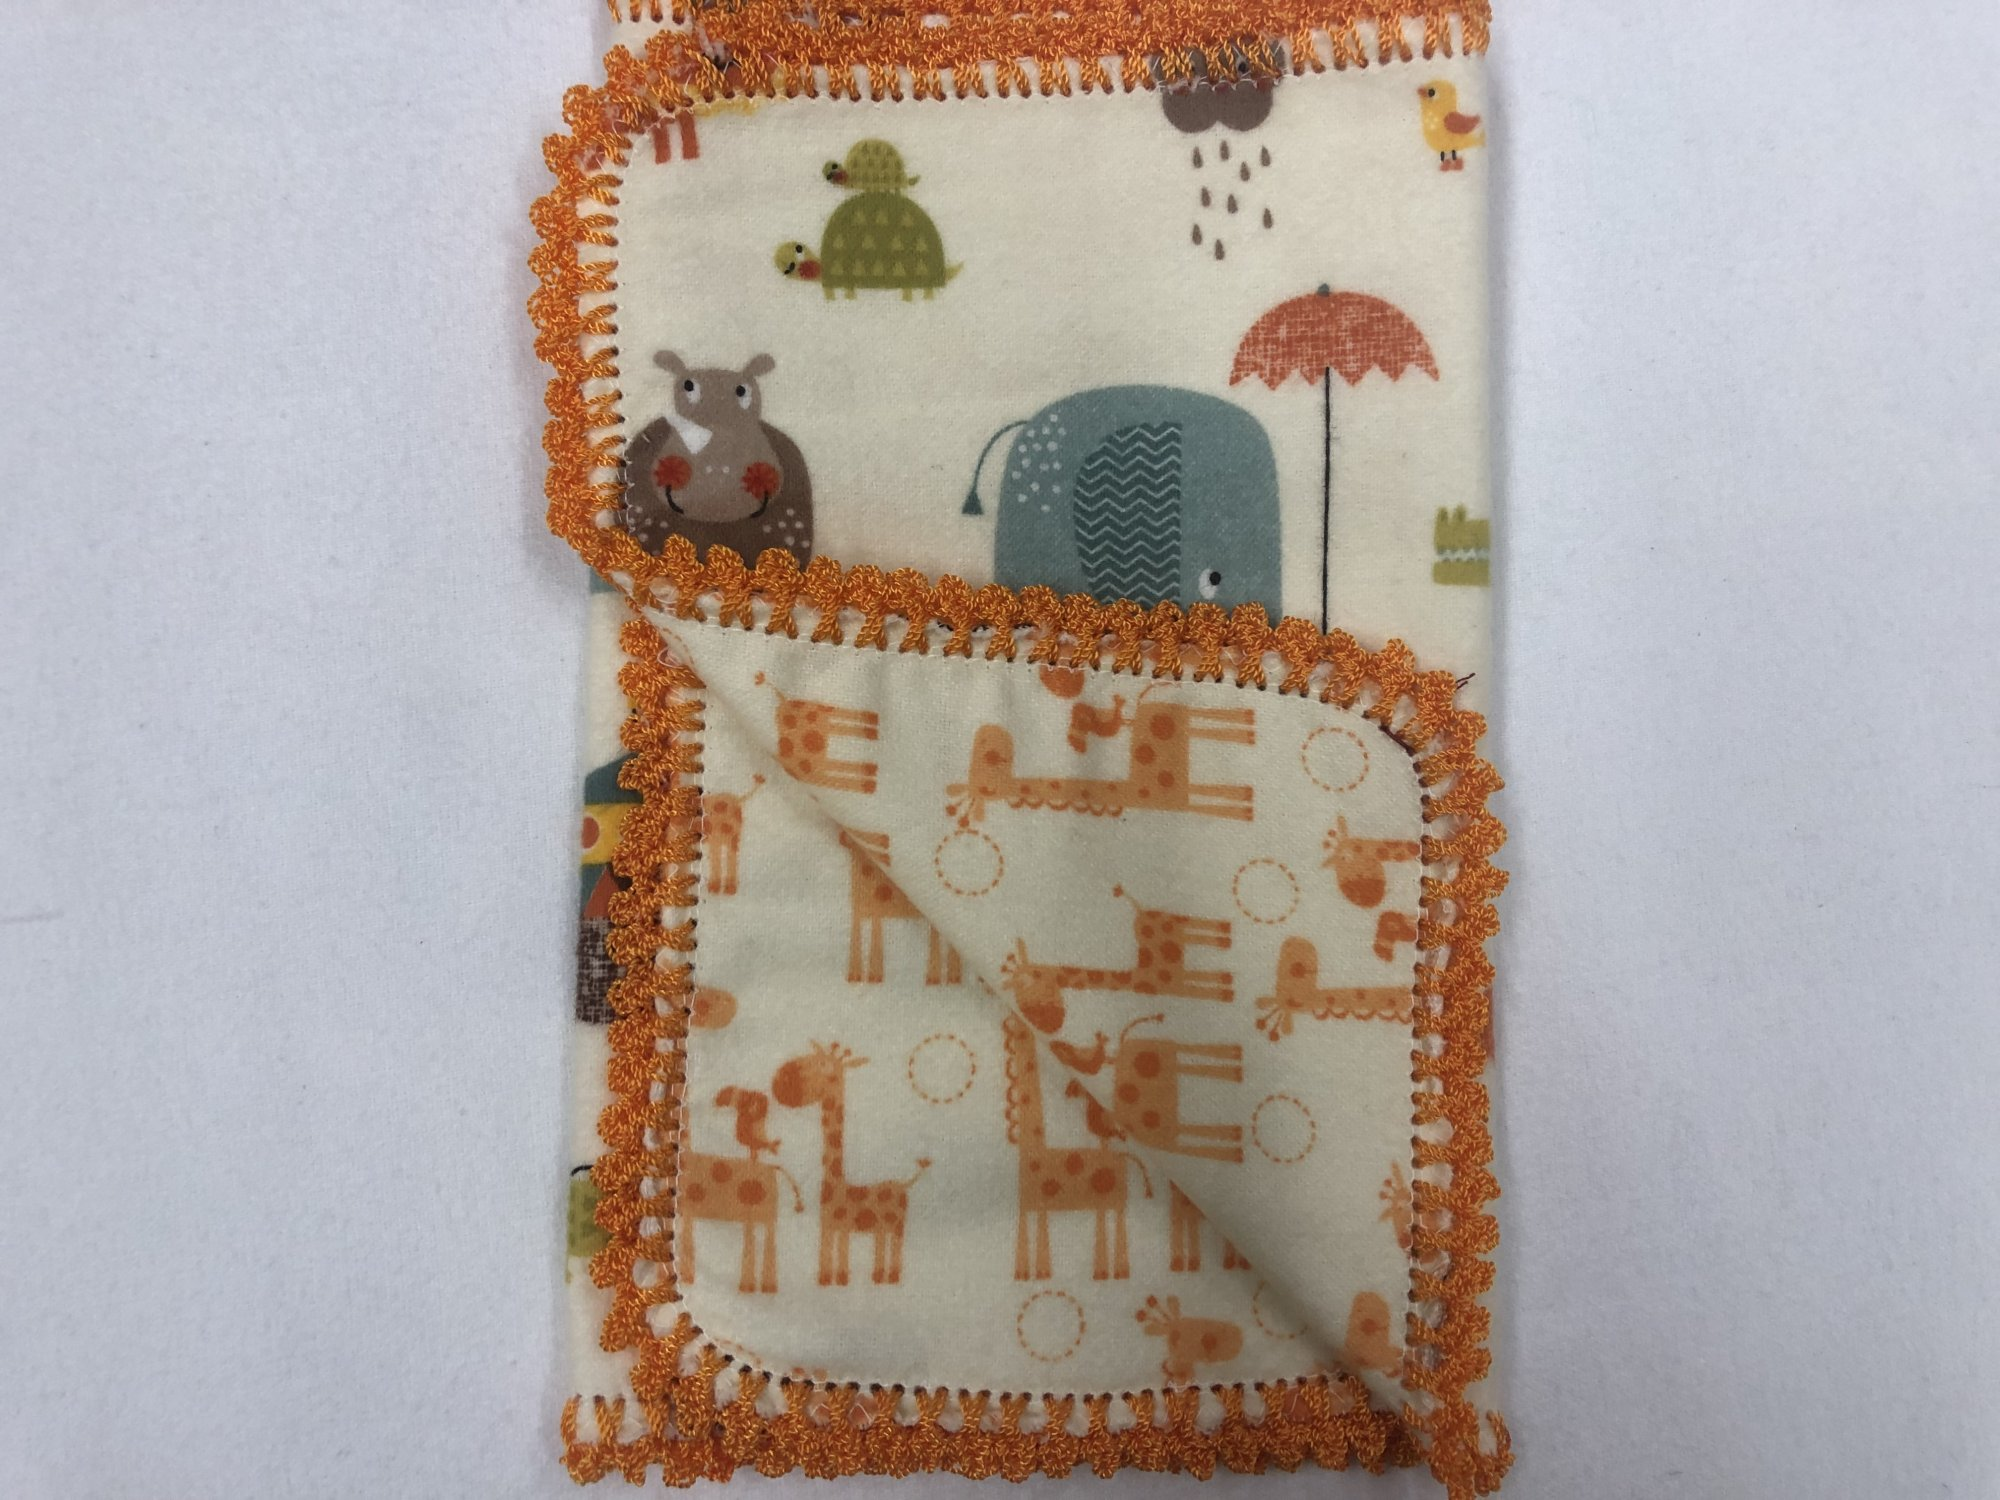 Noah's ark on cream background/Orange giraffe's on cream background crocheted burp cloth